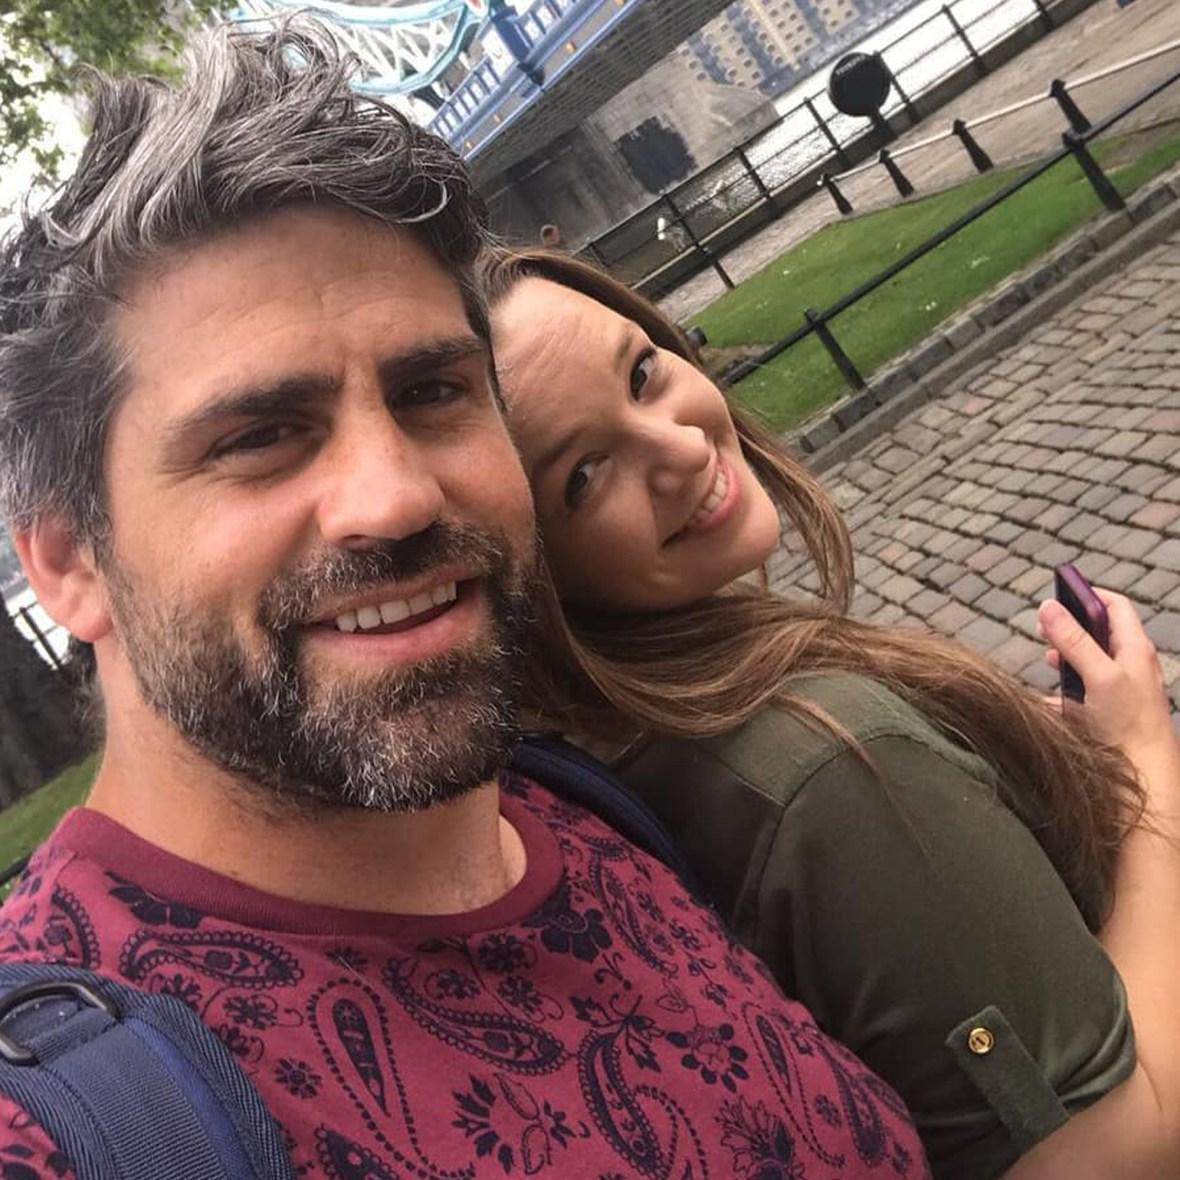 '90 Day Fiance' Couple Jon and Rachel Reunite in England